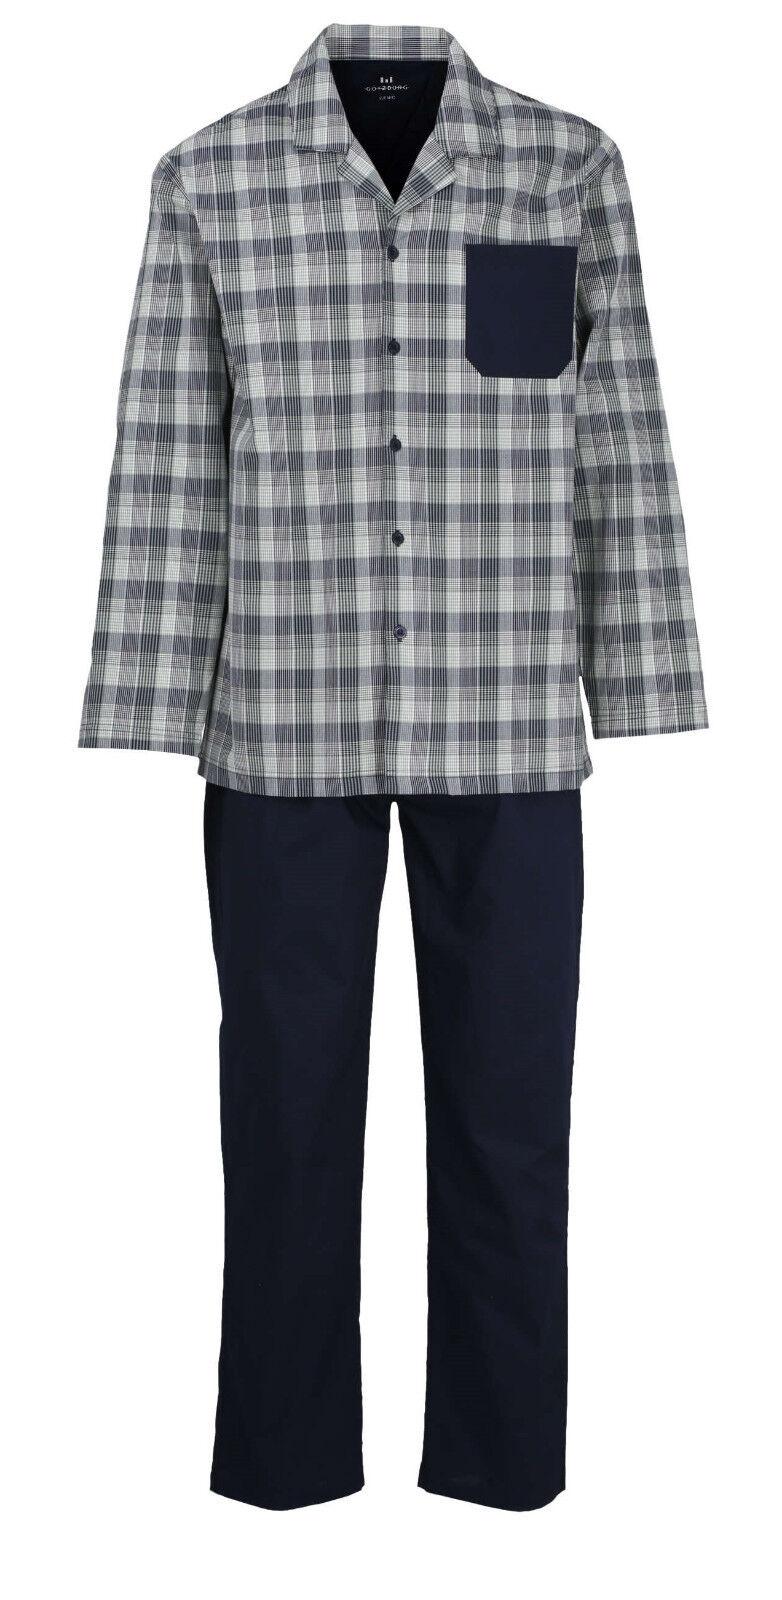 Götzburg Web-Schlafanzug Gr. 3XL Popelin-Pyjama Größe: 58 grün kariert geknöpft